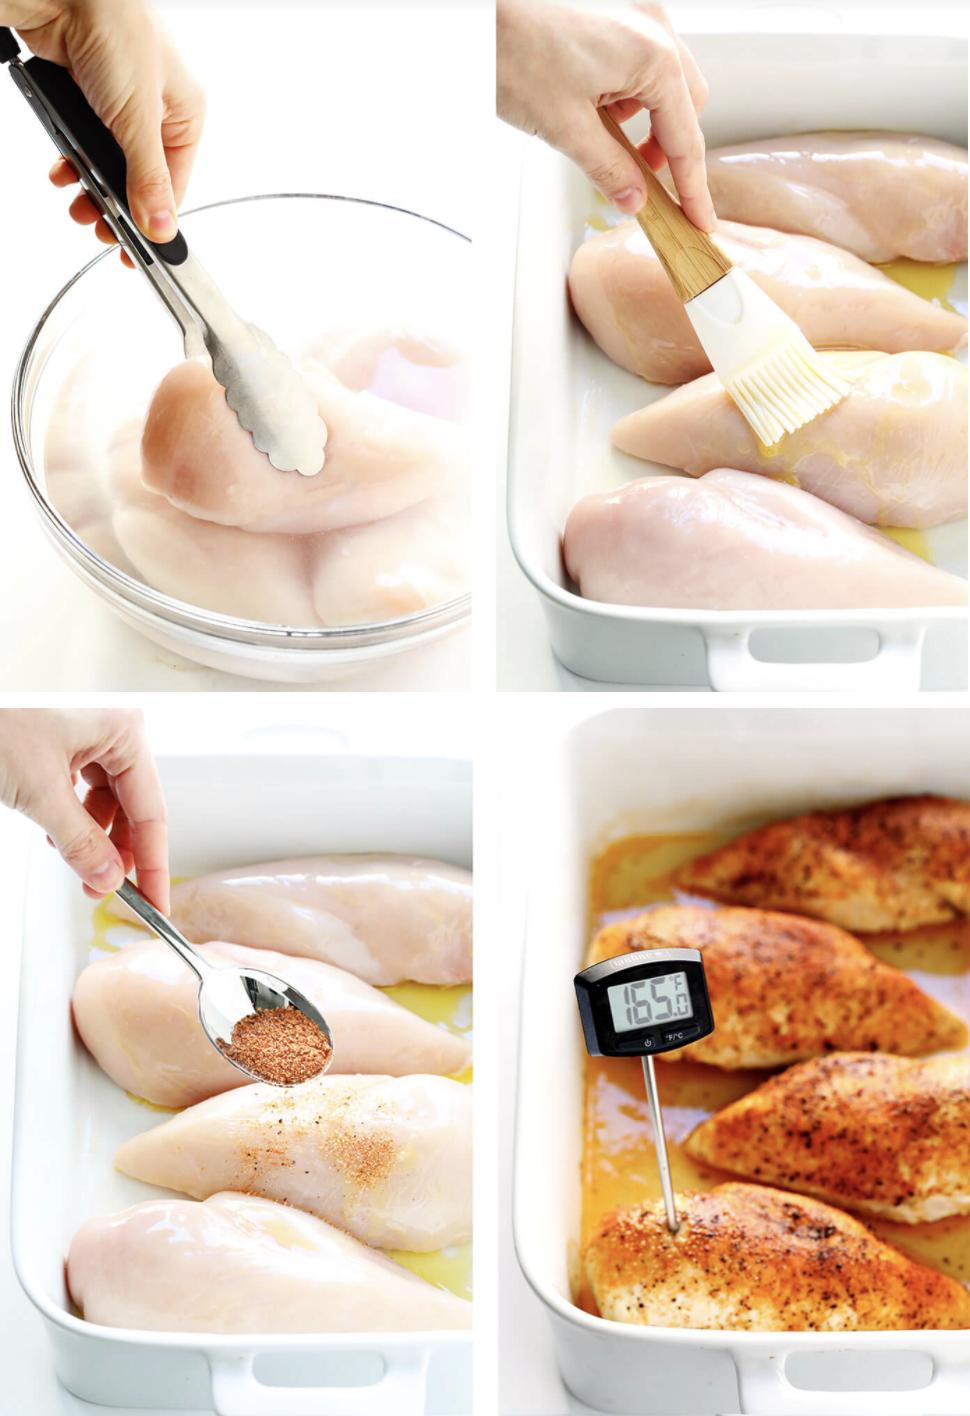 Brining chicken breasts